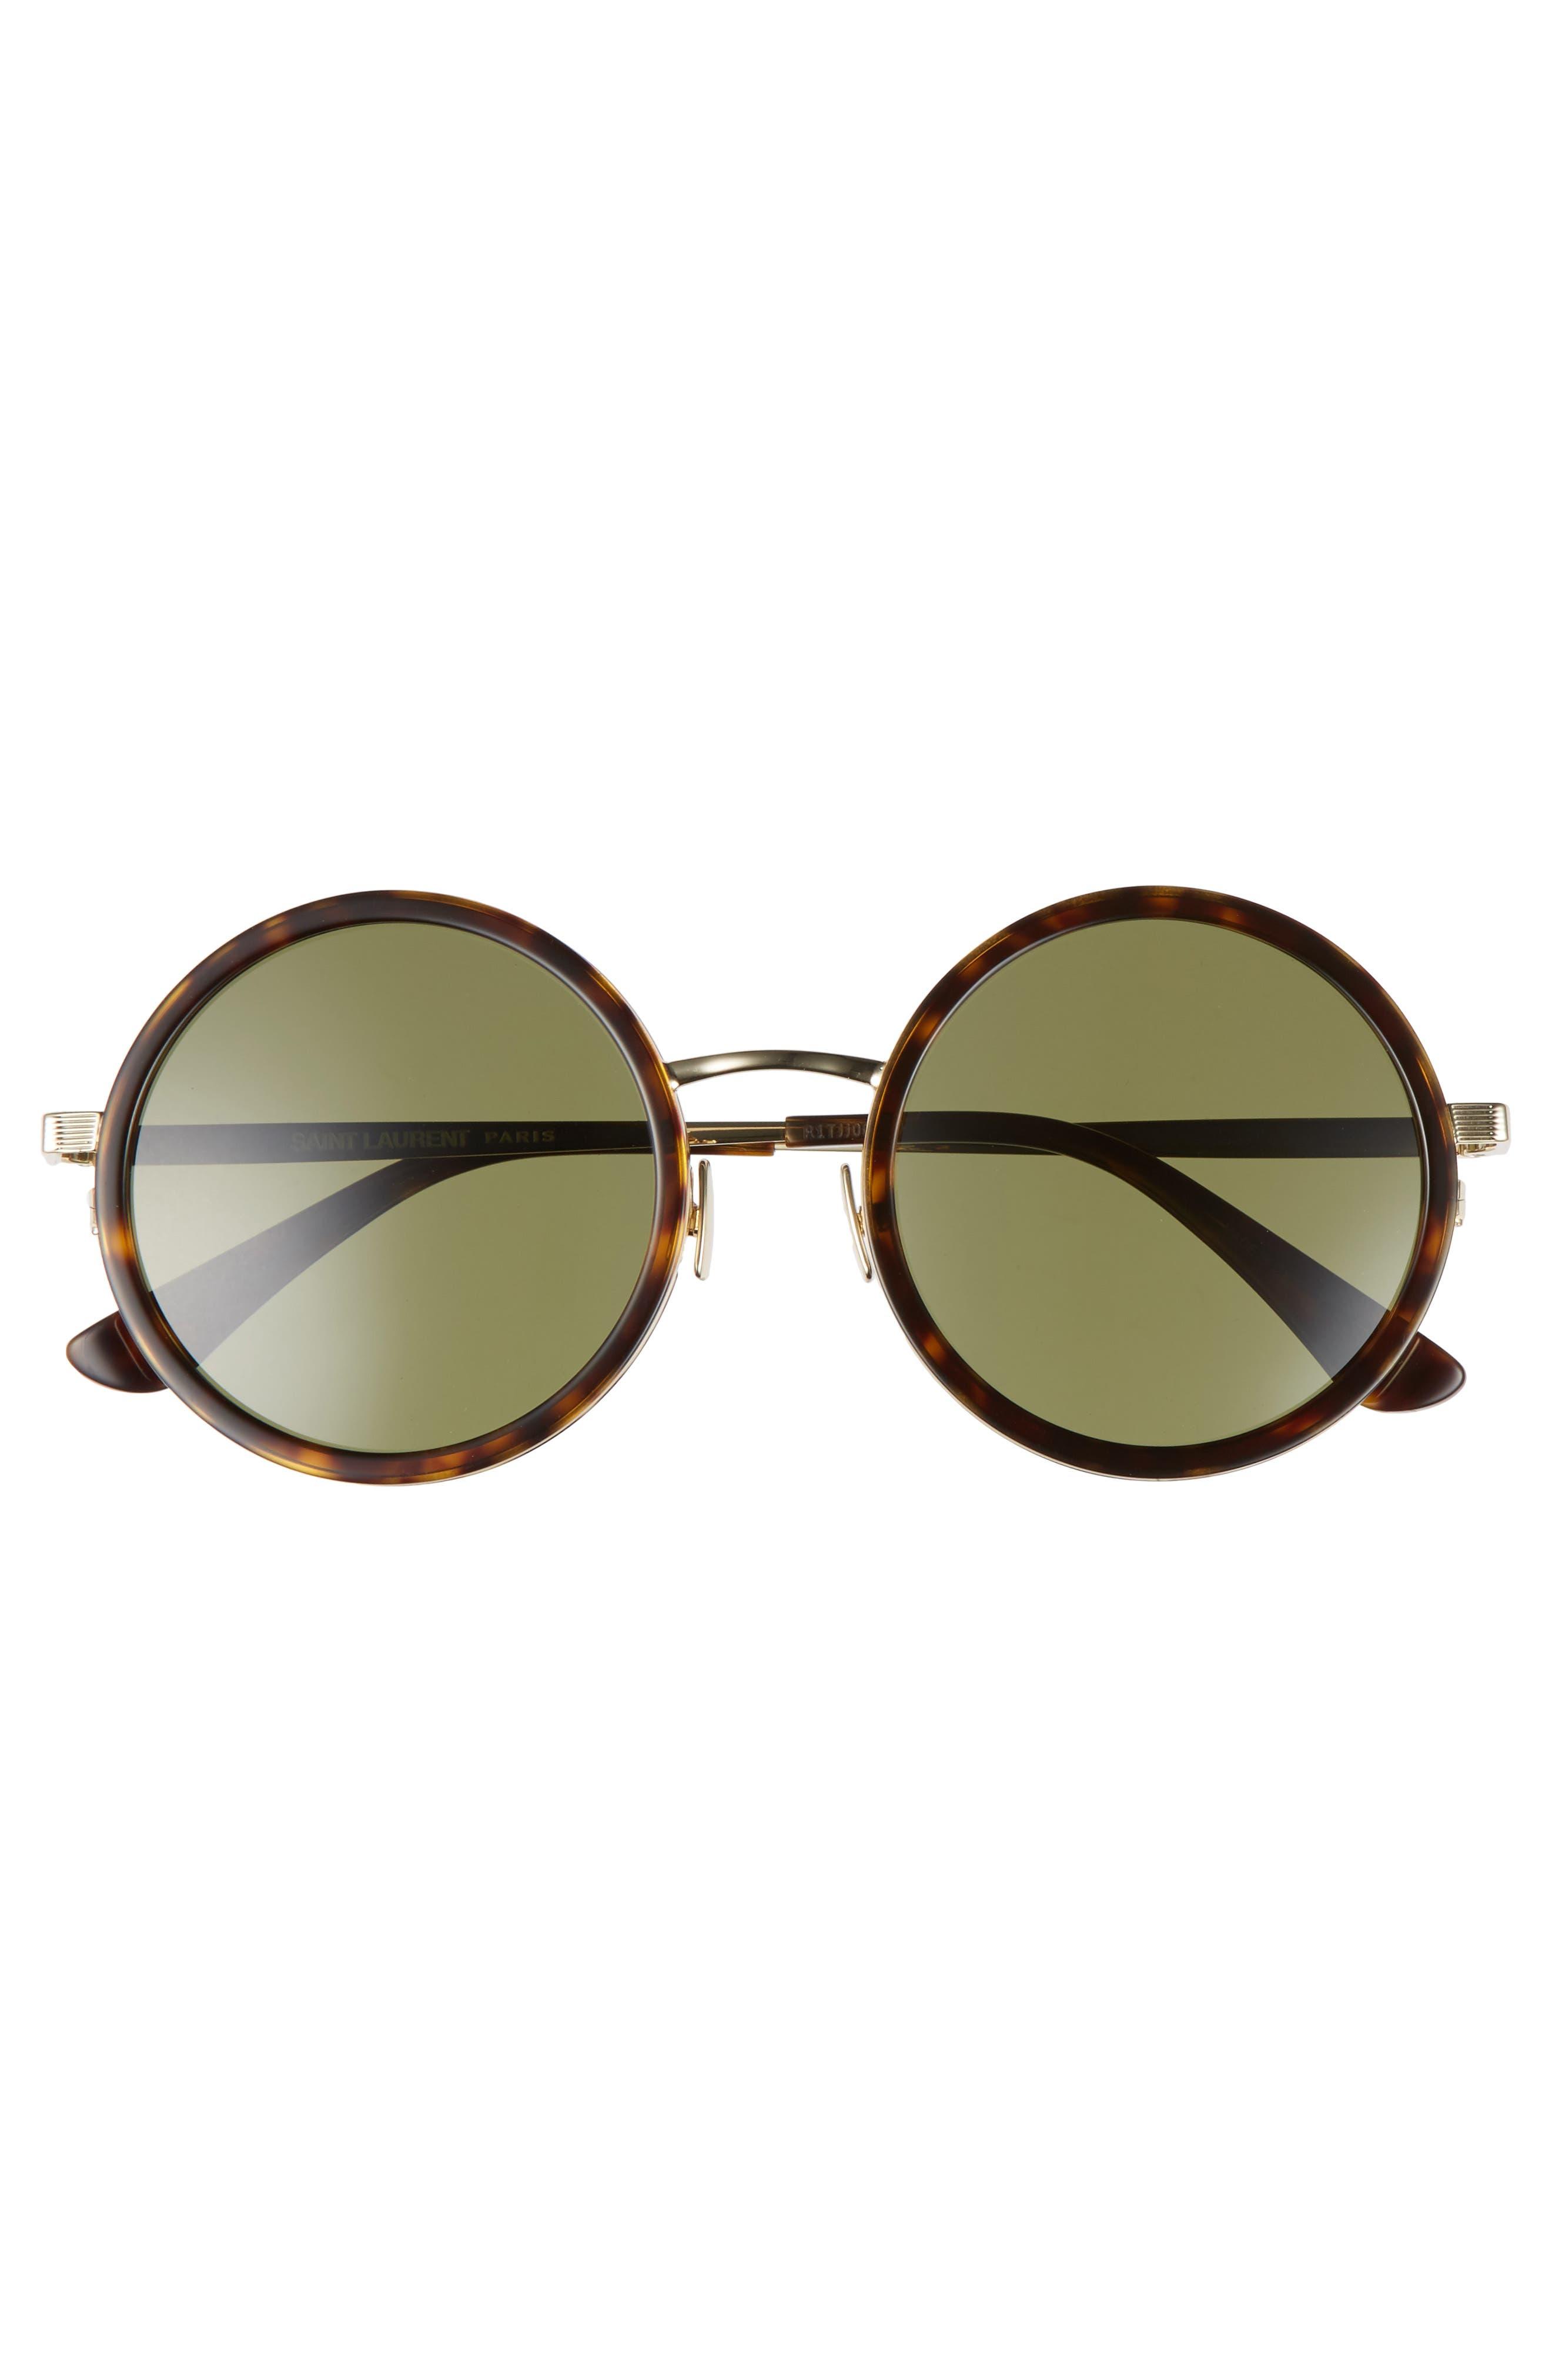 52mm Round Sunglasses,                             Alternate thumbnail 3, color,                             200